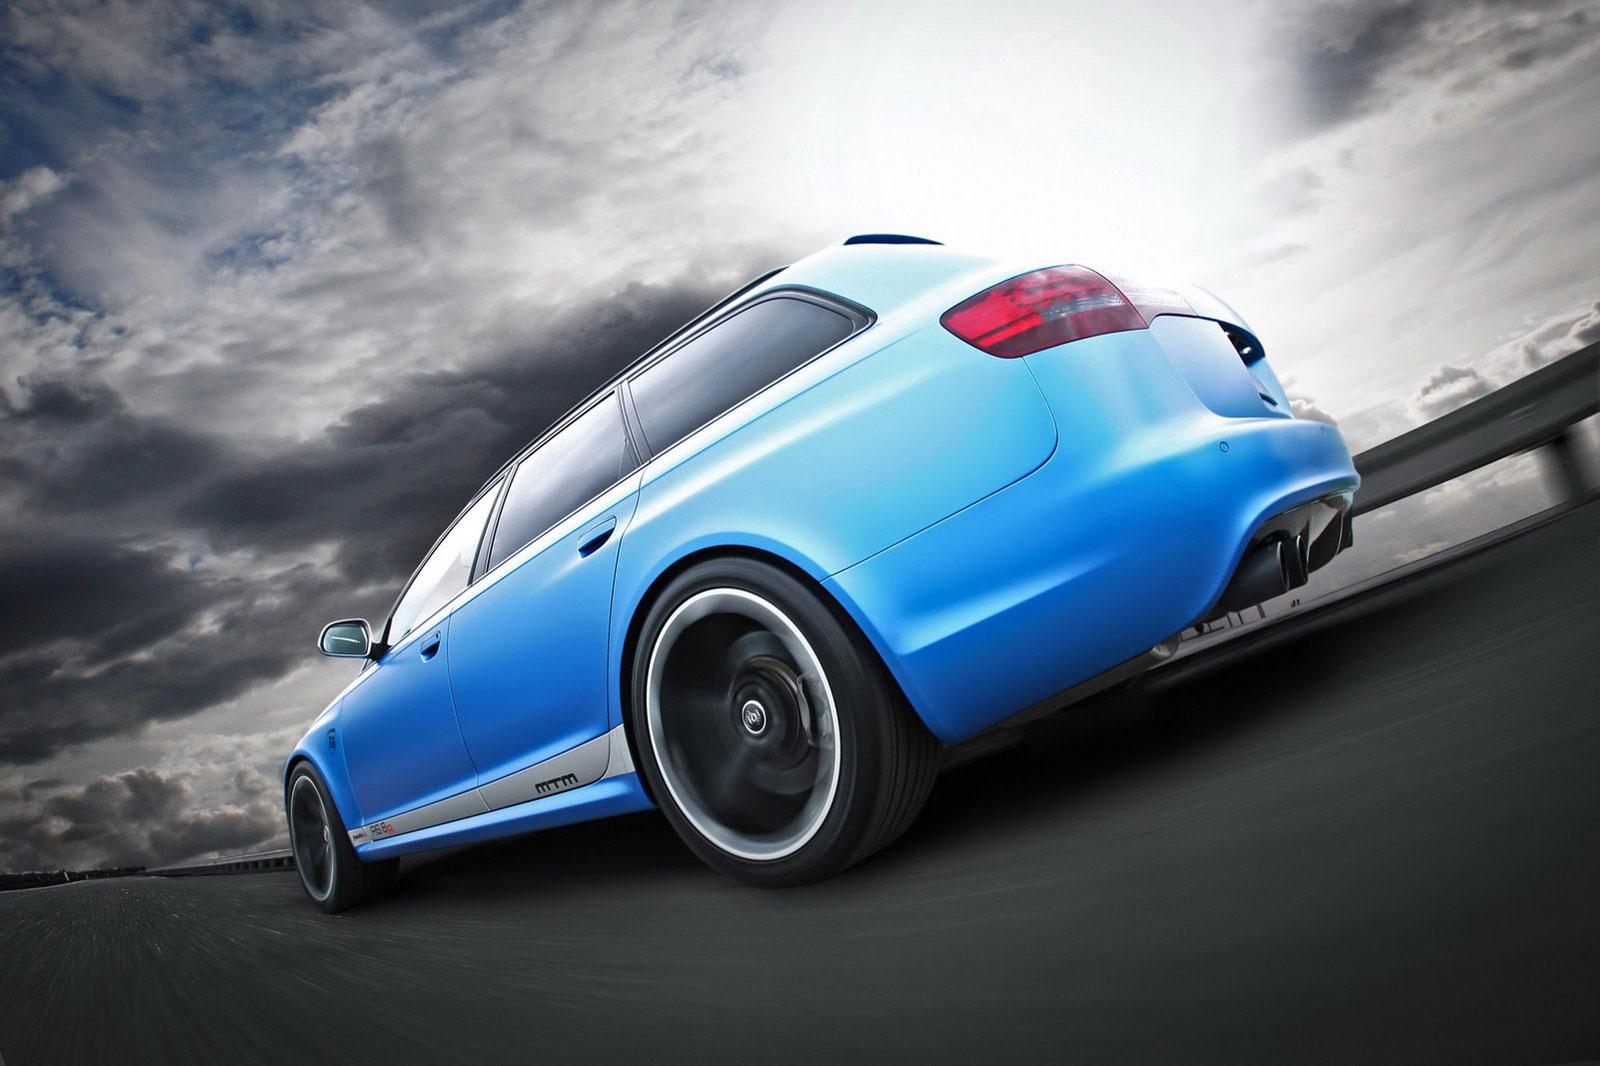 Fostla a MTM vytvořili velmi našlapané Audi RS6 Avant 2